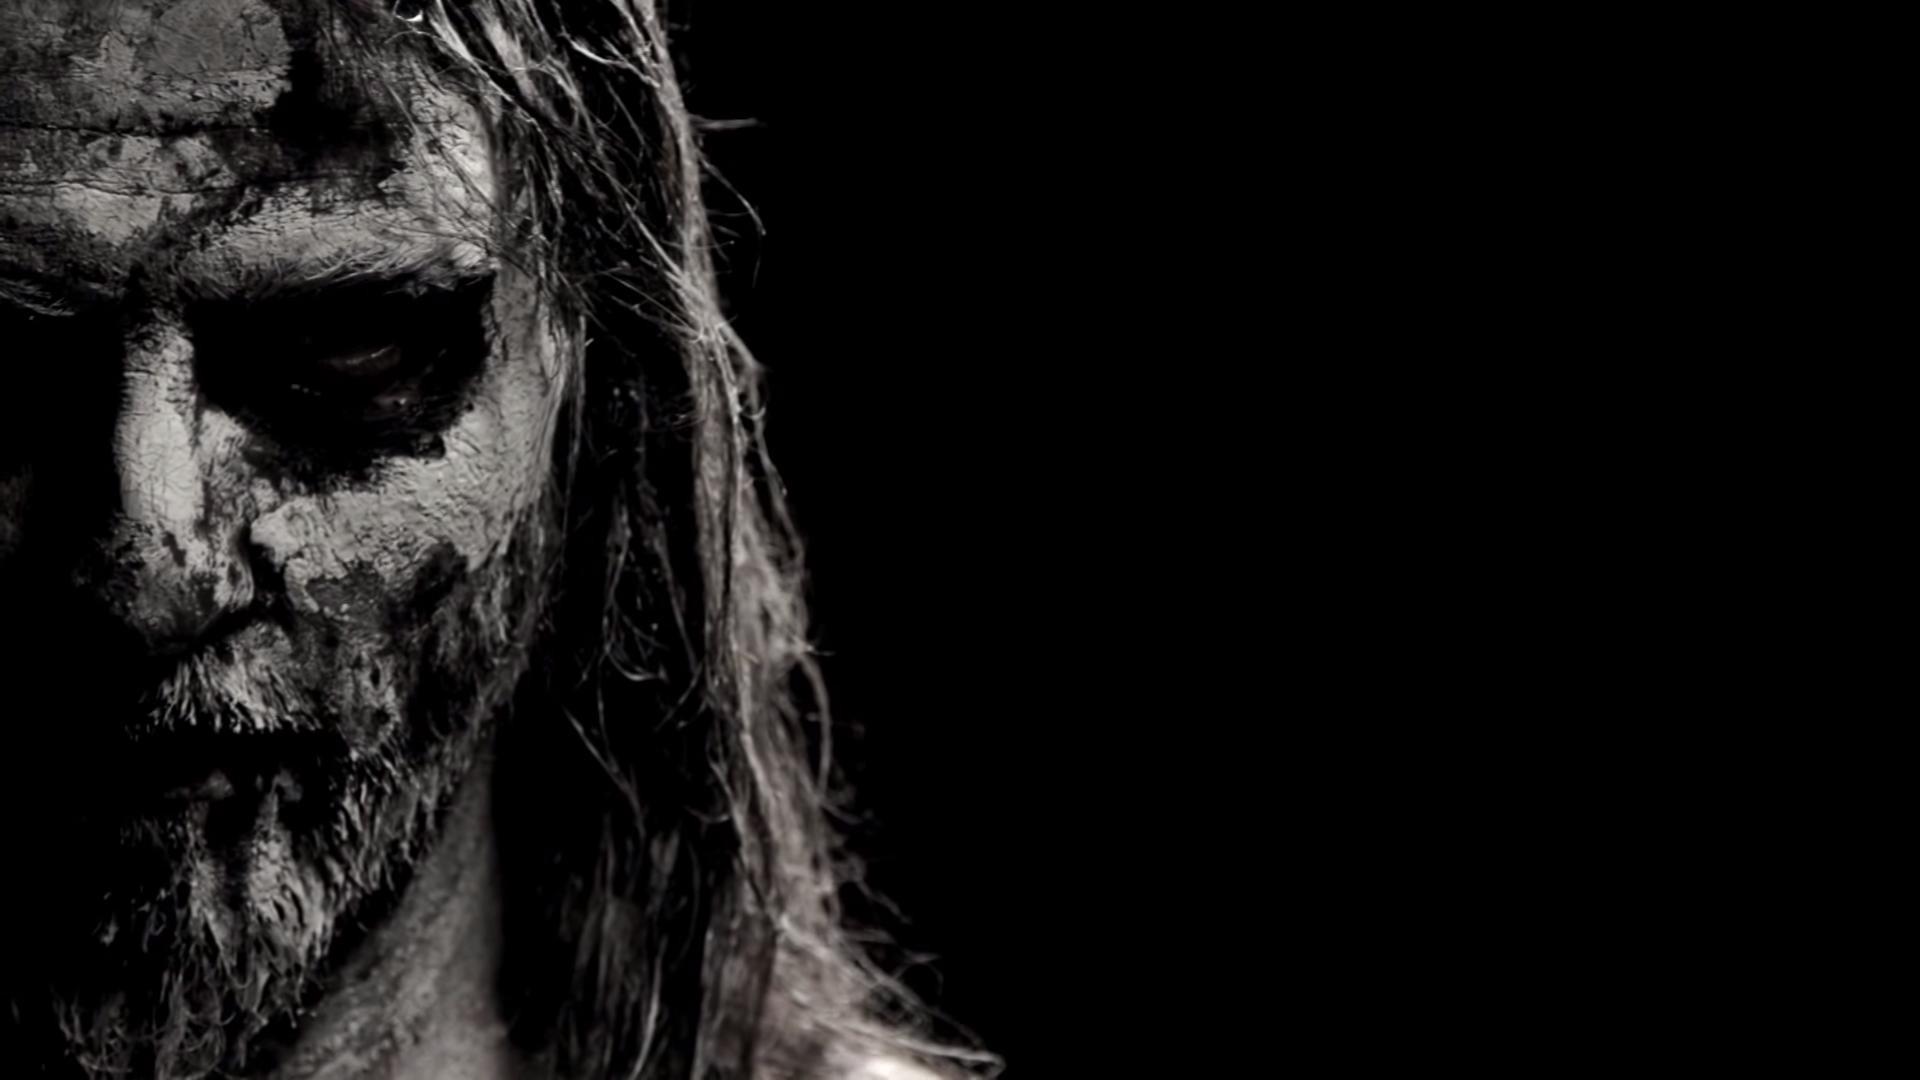 Black metal wallpaper wallpapertag - Death metal wallpaper ...